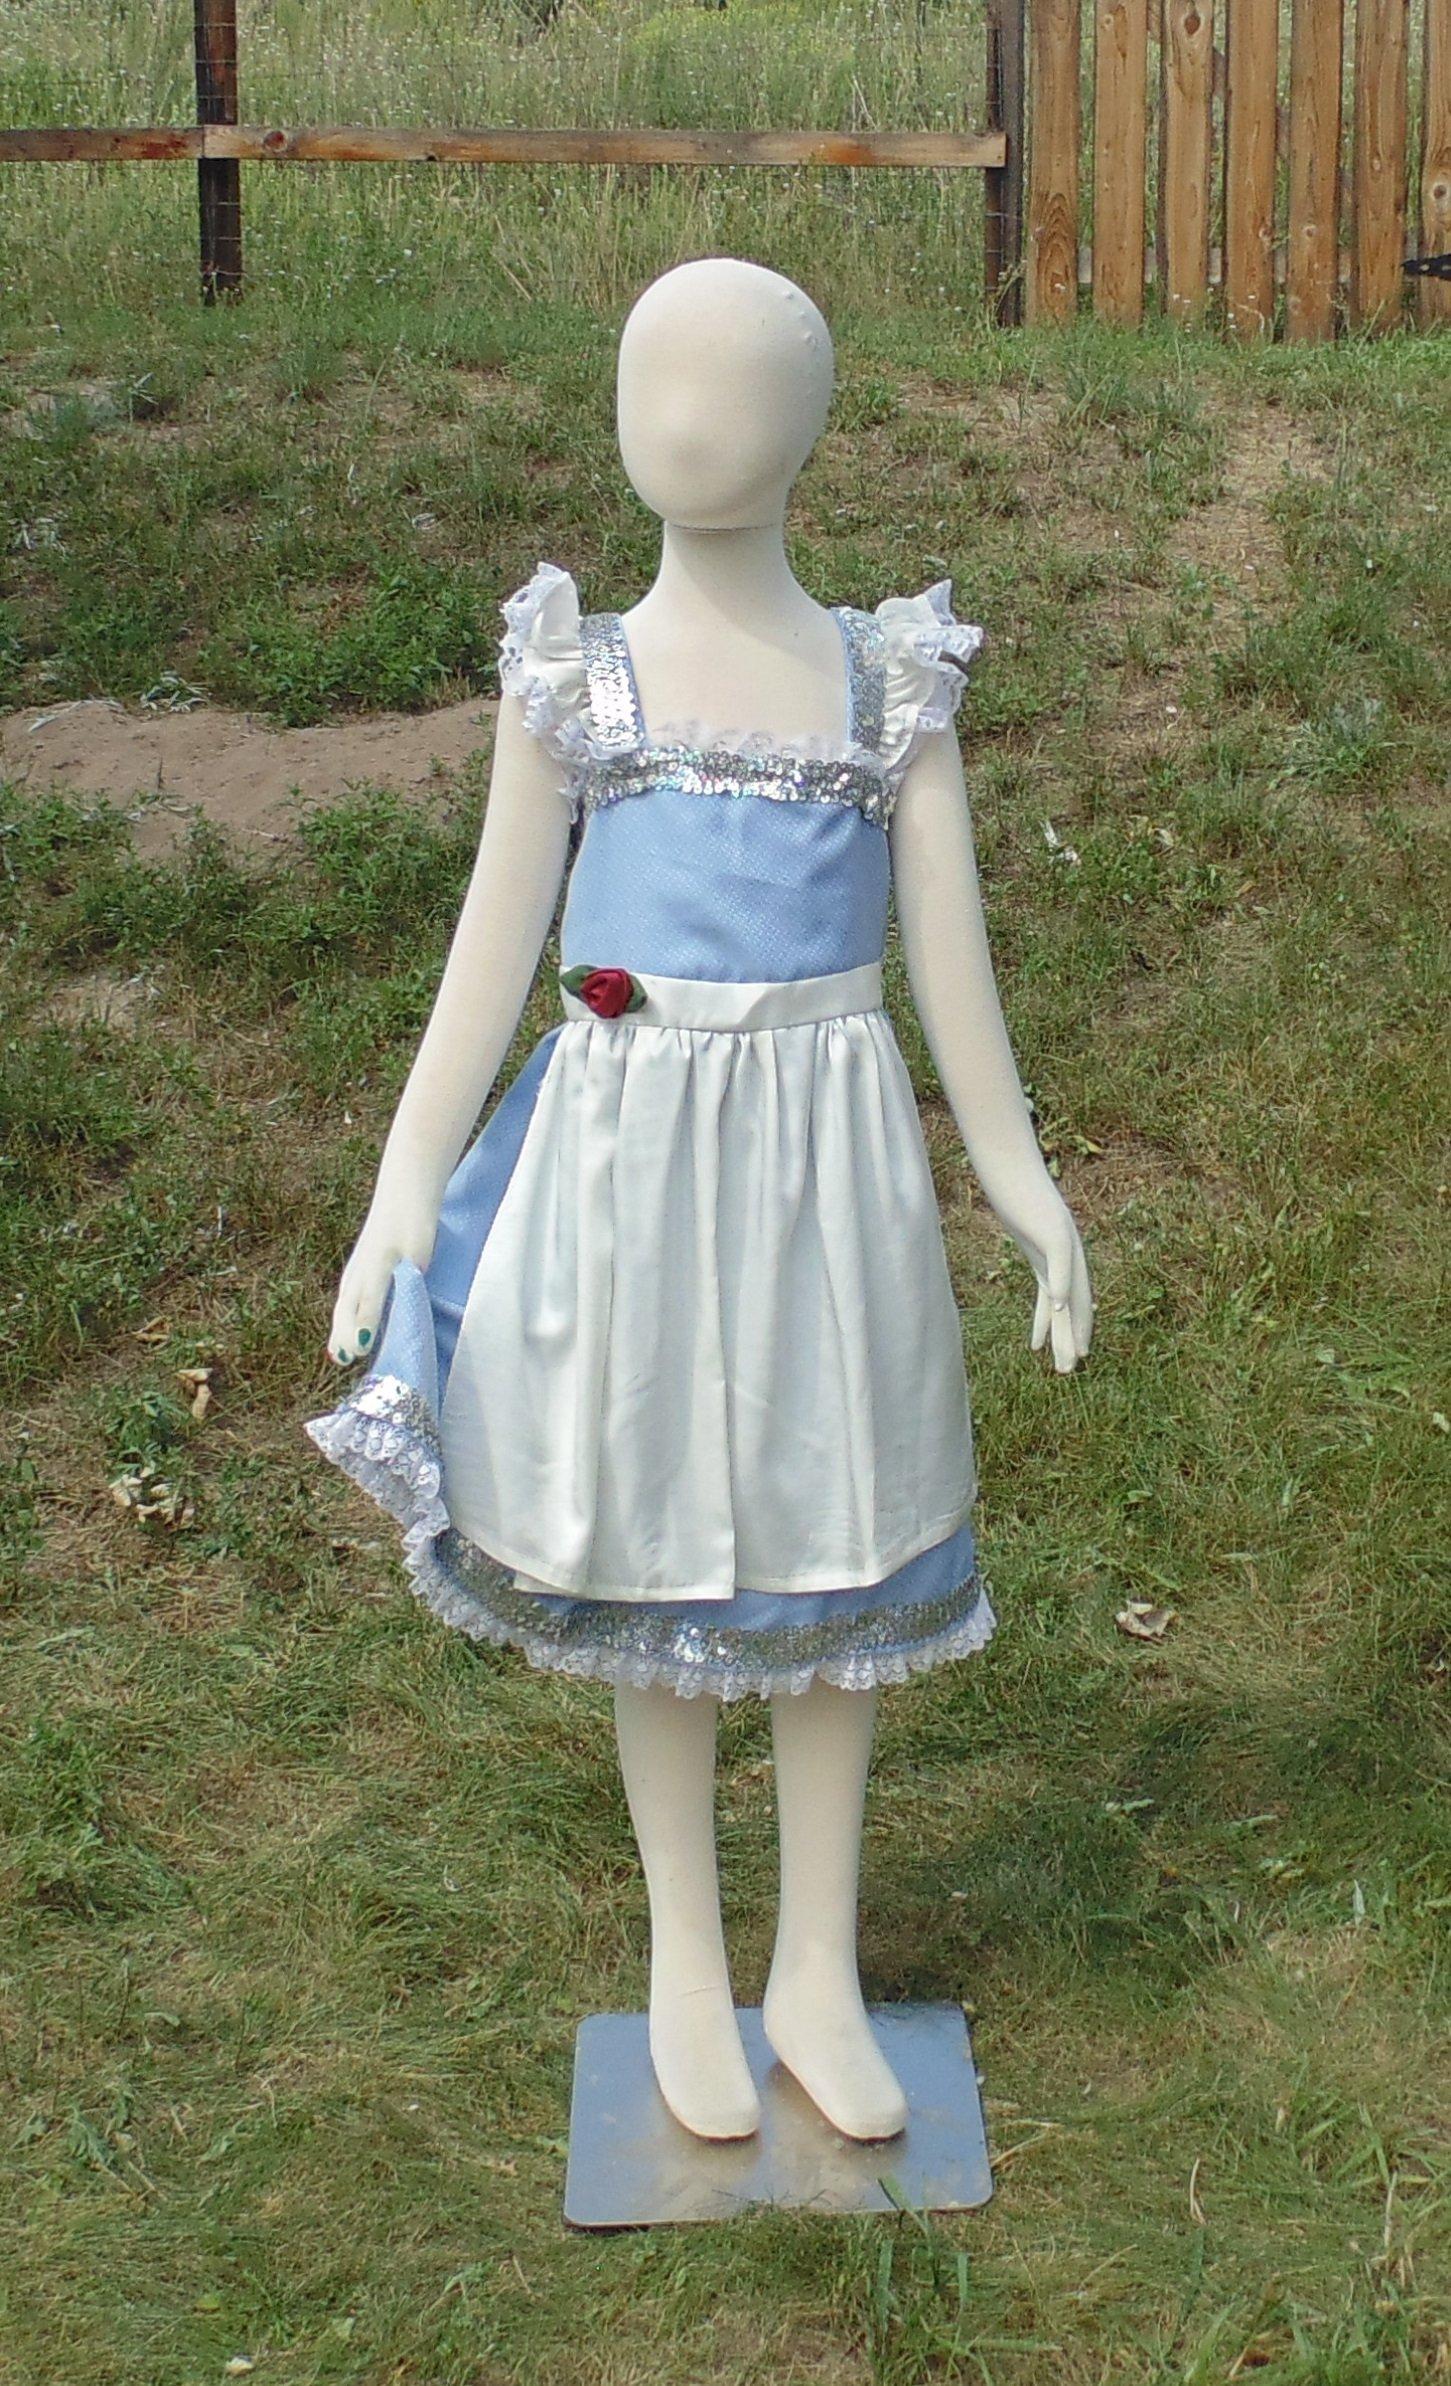 Girls 6-8 Peasant Belle dress up apron